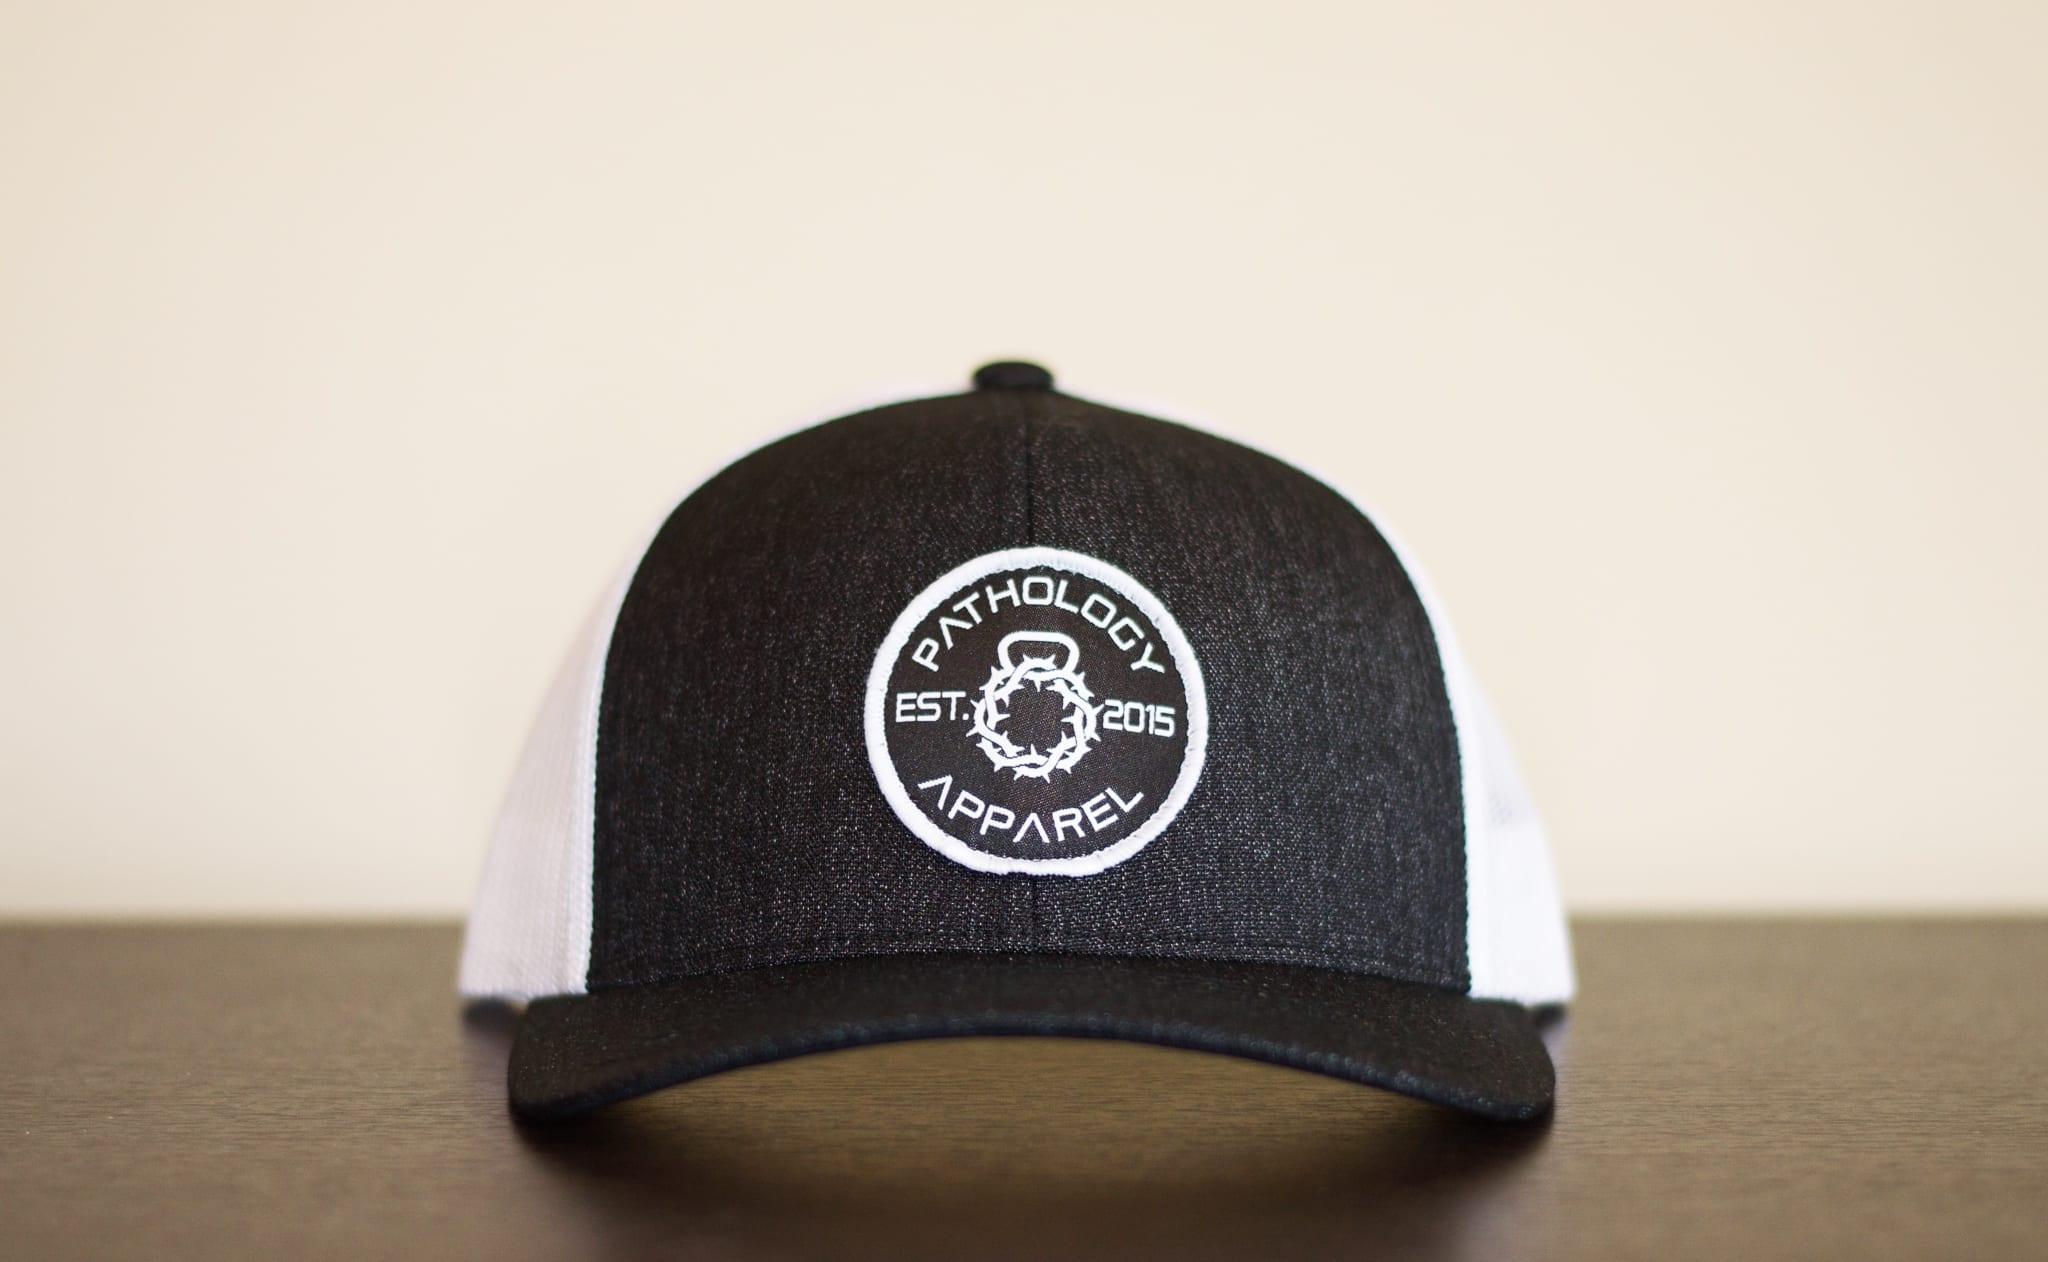 3f906f09b46c3 The Pathology Apparel Heather Black Patch Performance Hat